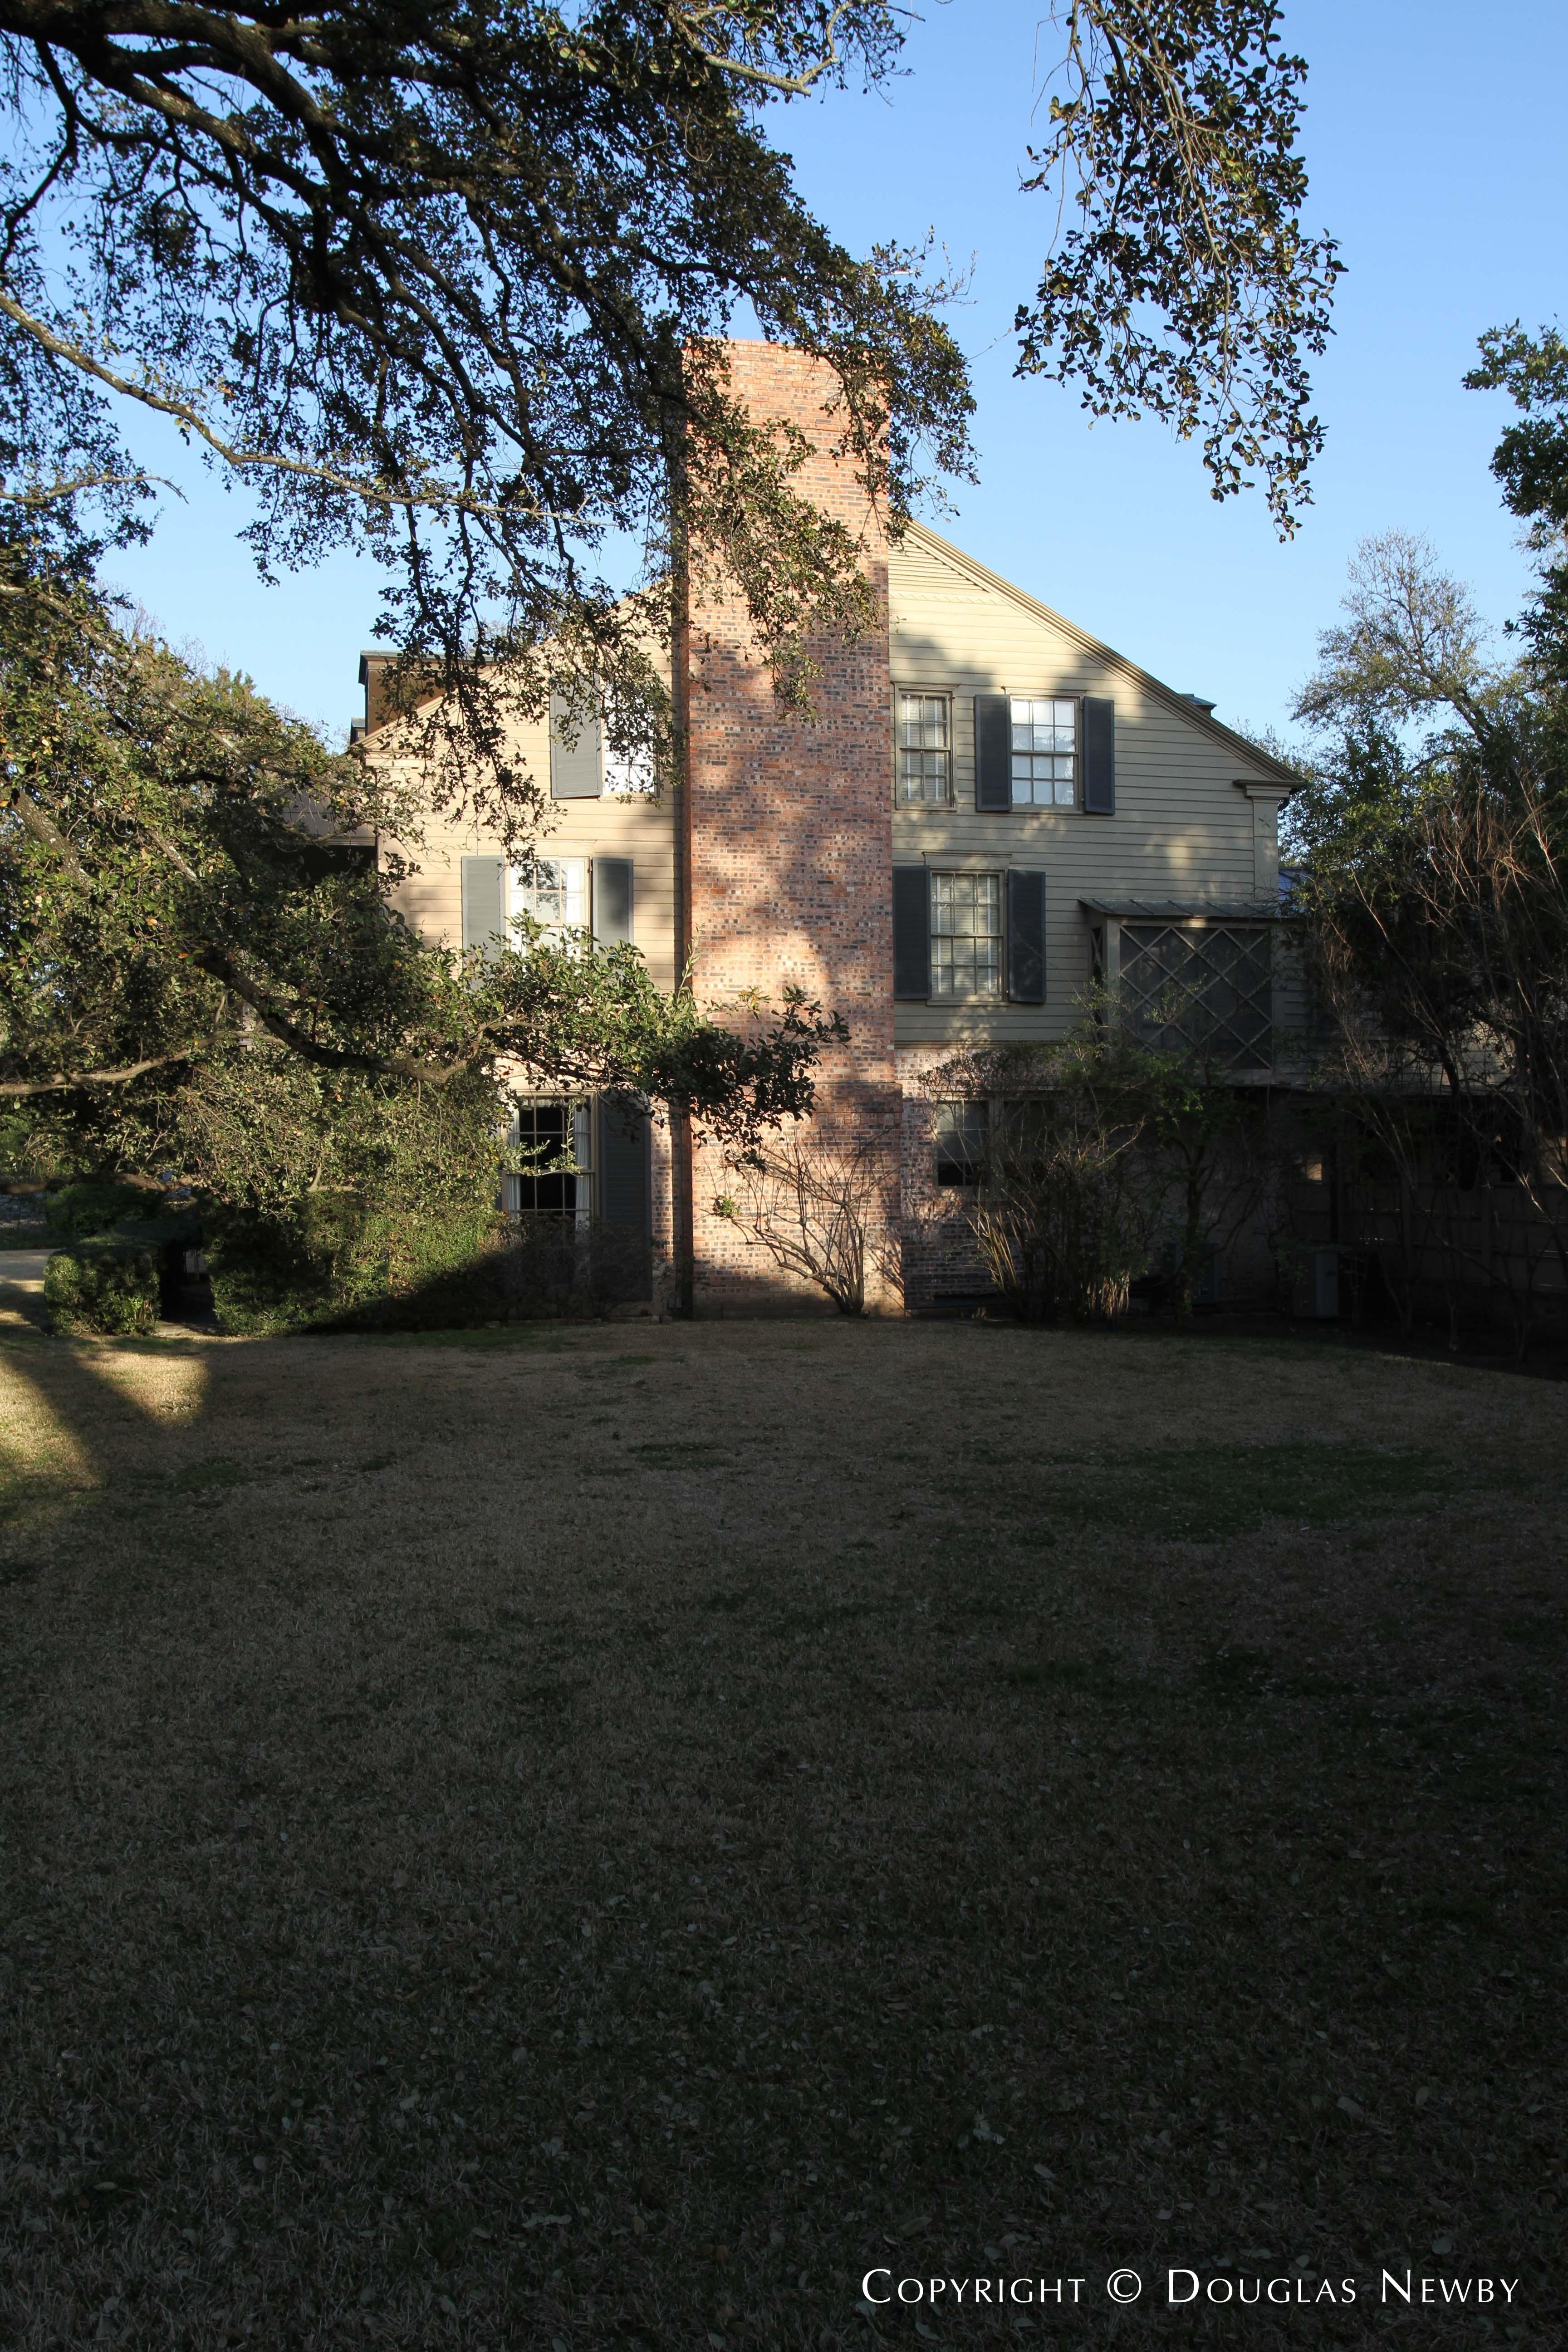 Texas Modern St. Andrews Place Neighborhood Home